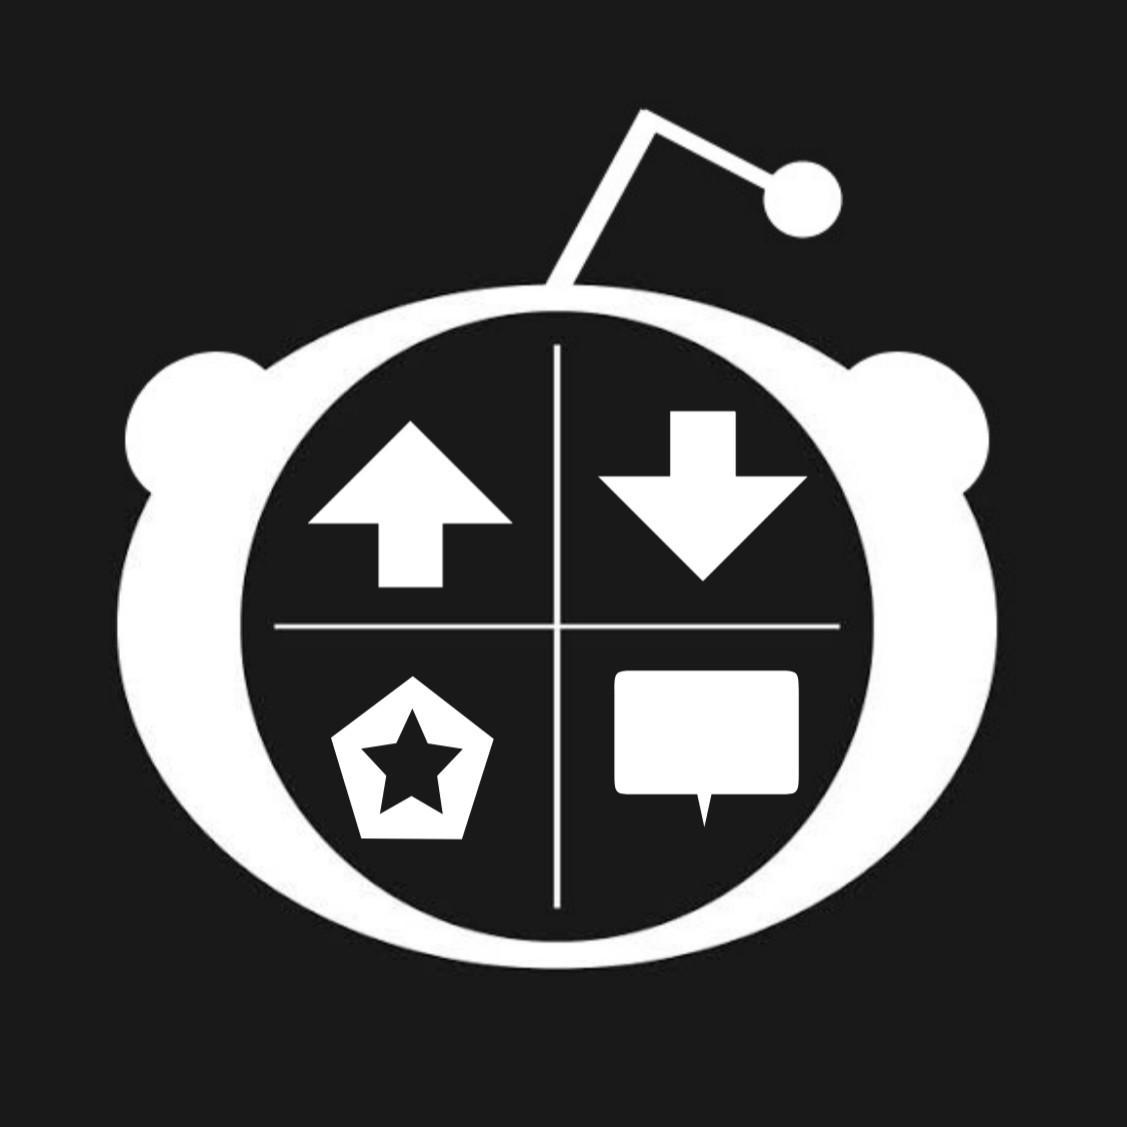 NO SPOILERS] Made the Ozark logo more reddit.